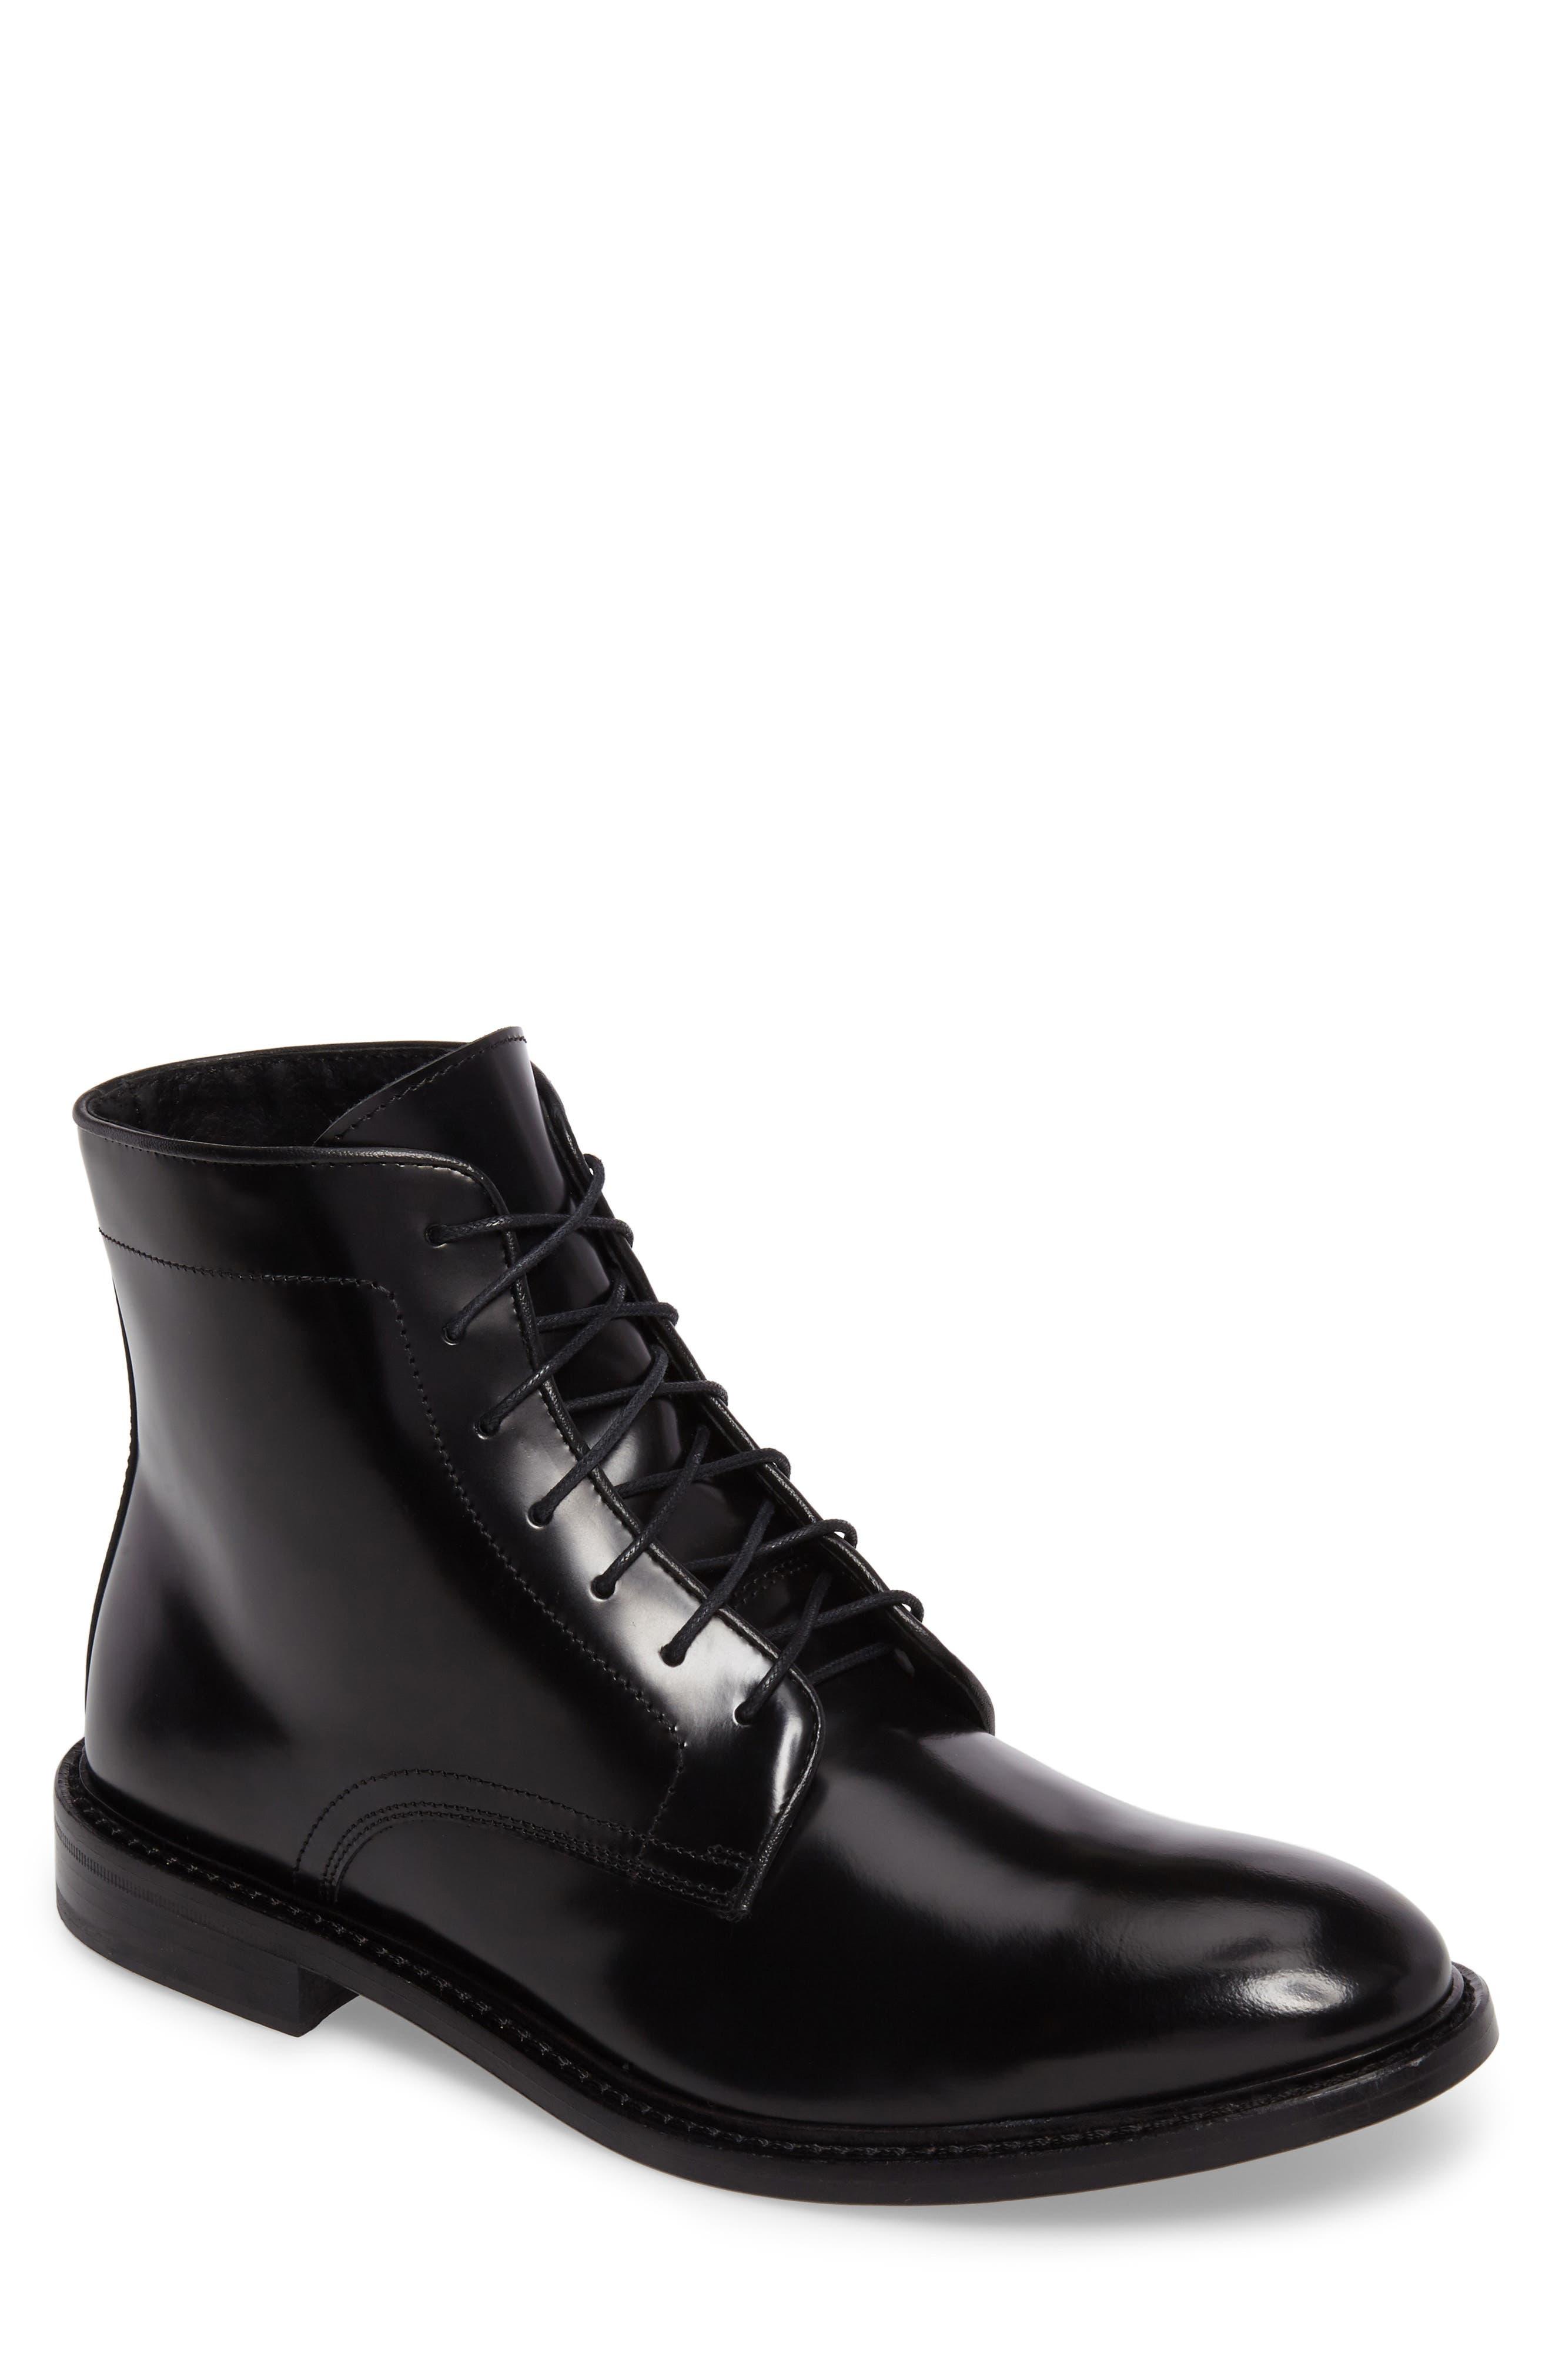 Alternate Image 1 Selected - Kenneth Cole New York Plain Toe Boot (Men)